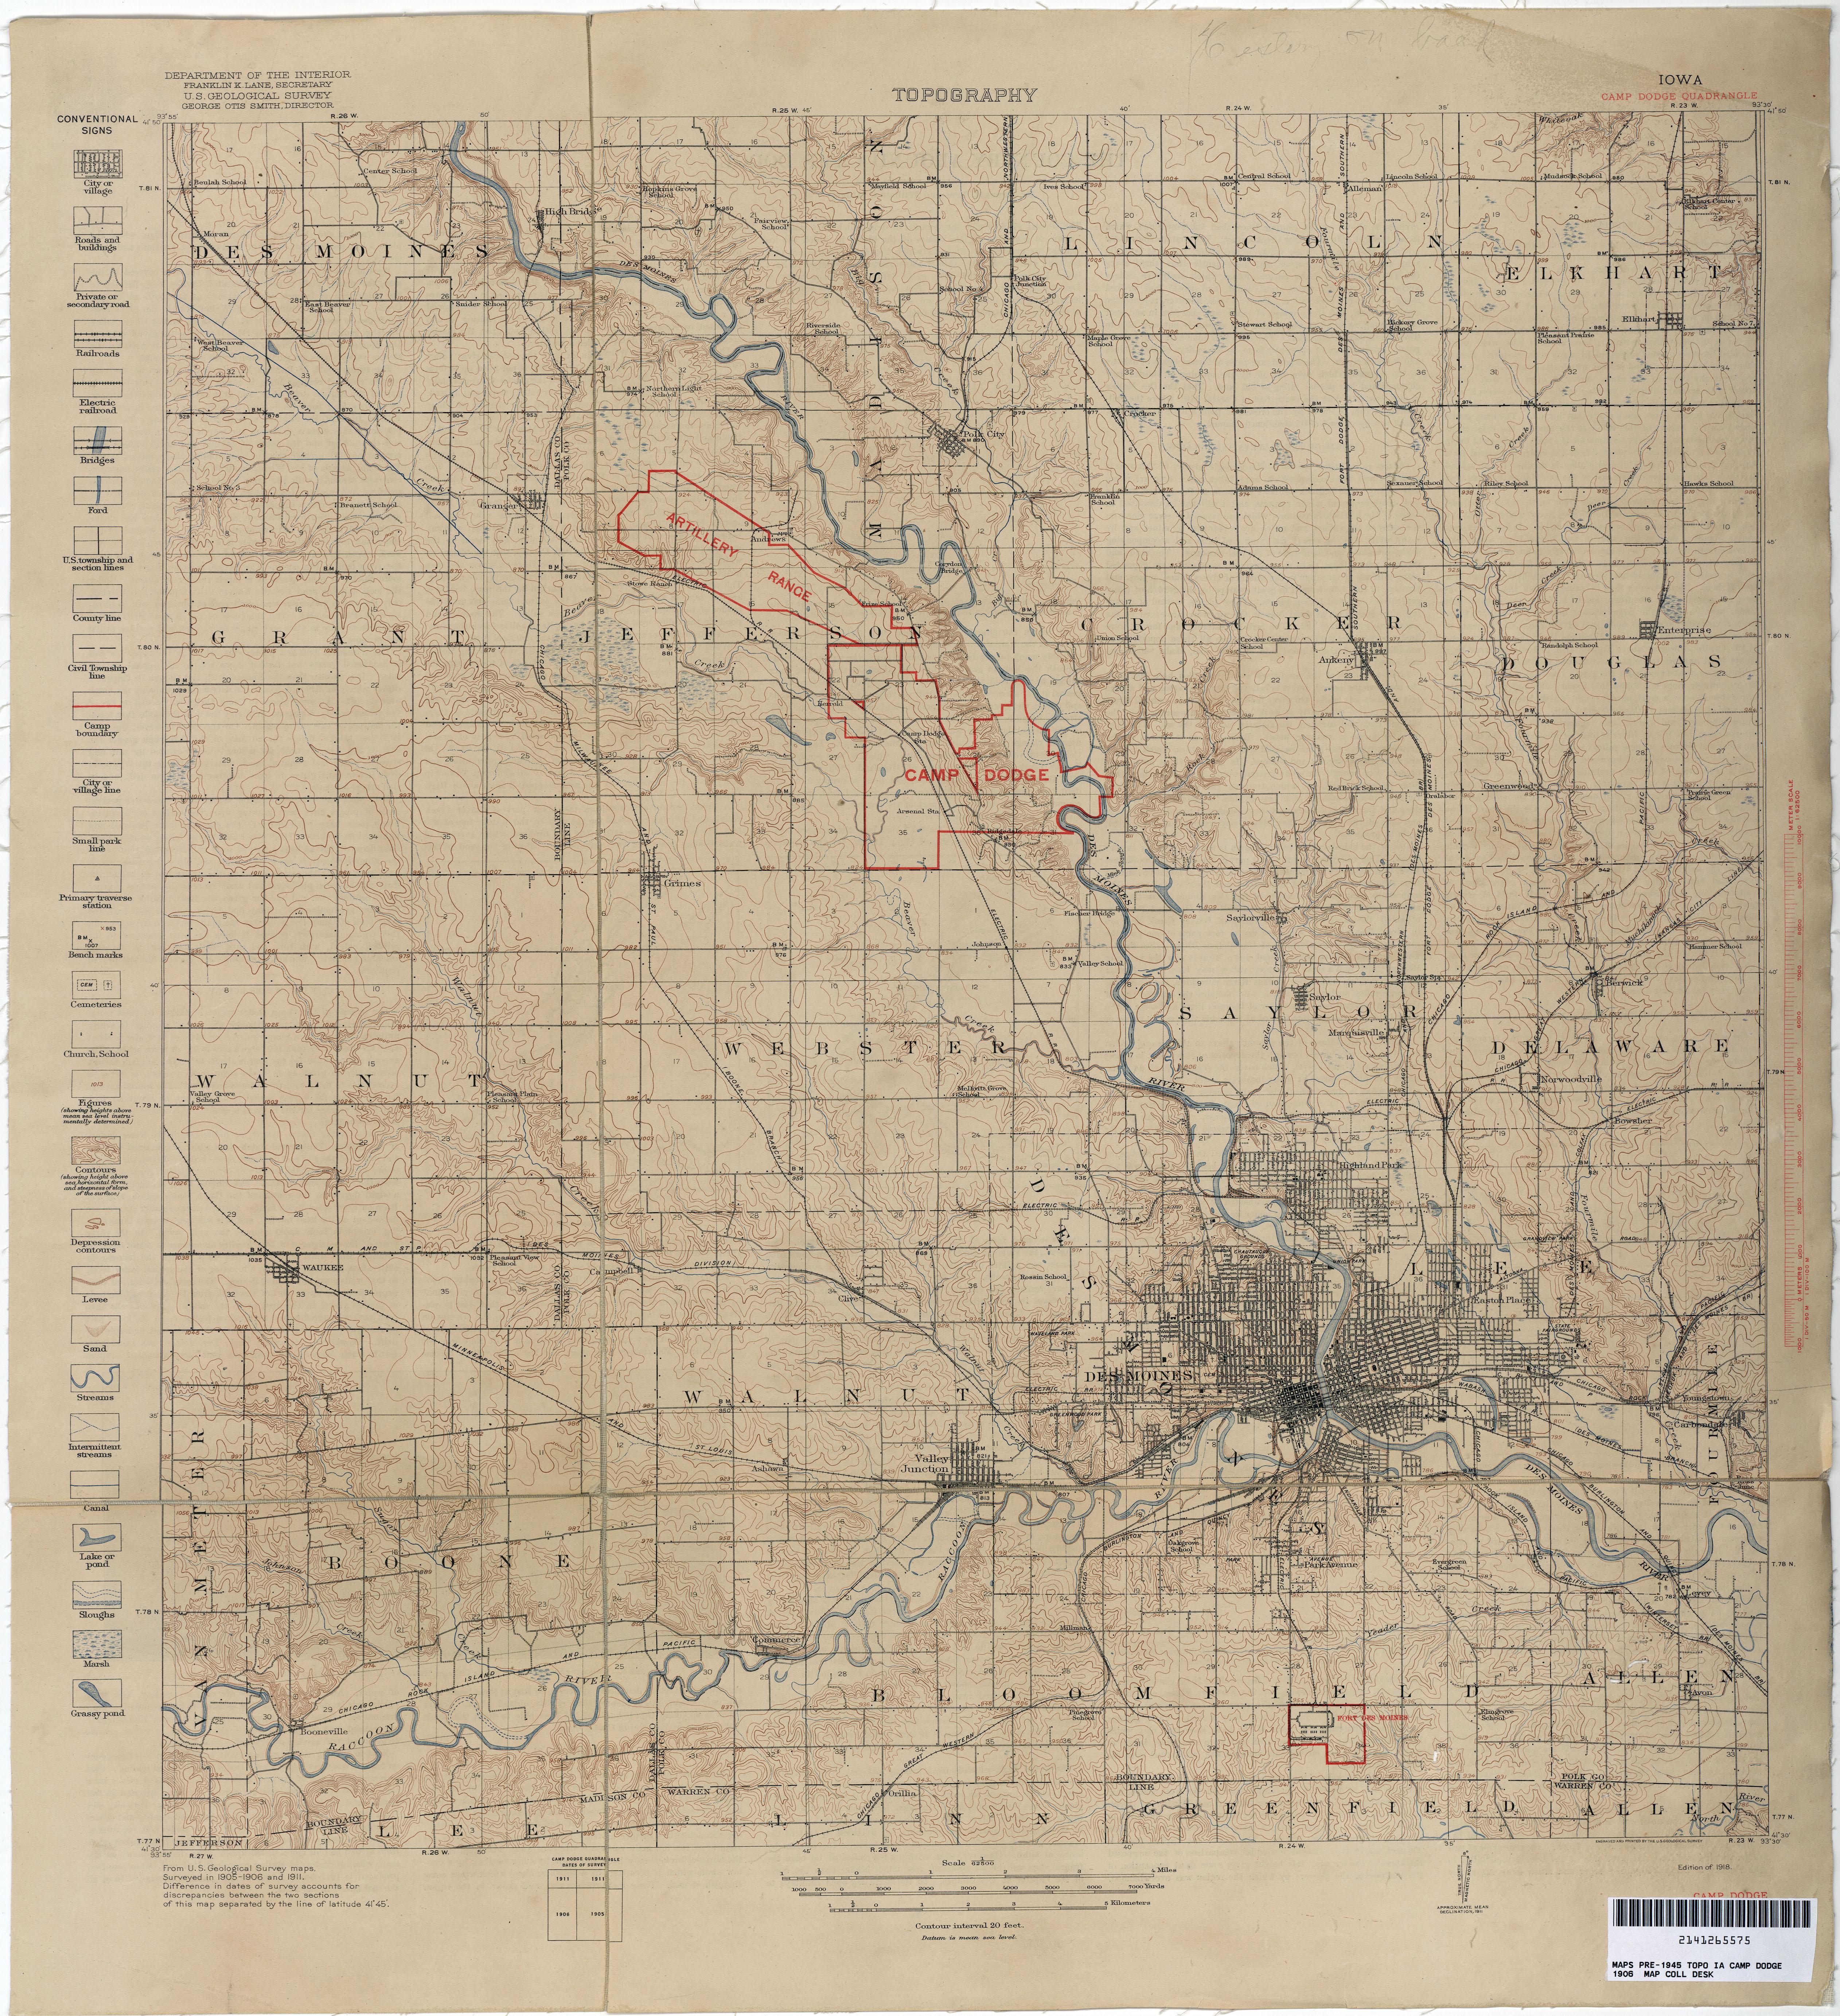 Iowa Historical Topographic Maps PerryCastañeda Map Collection - Iowa map